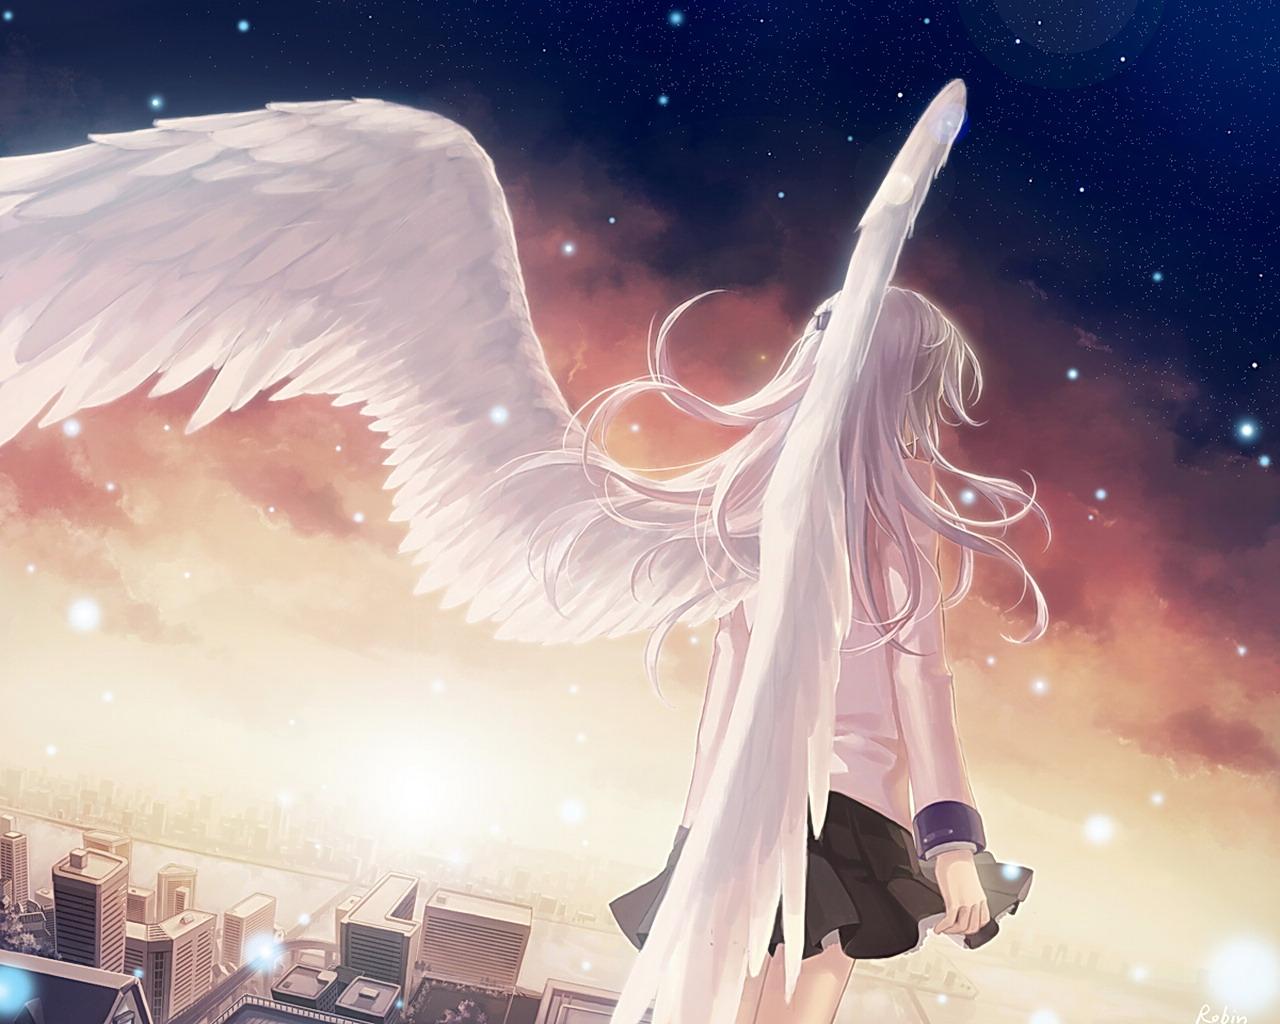 Angel Beats Wallpaper エンジェル ビーツ 壁紙 Naver まとめ